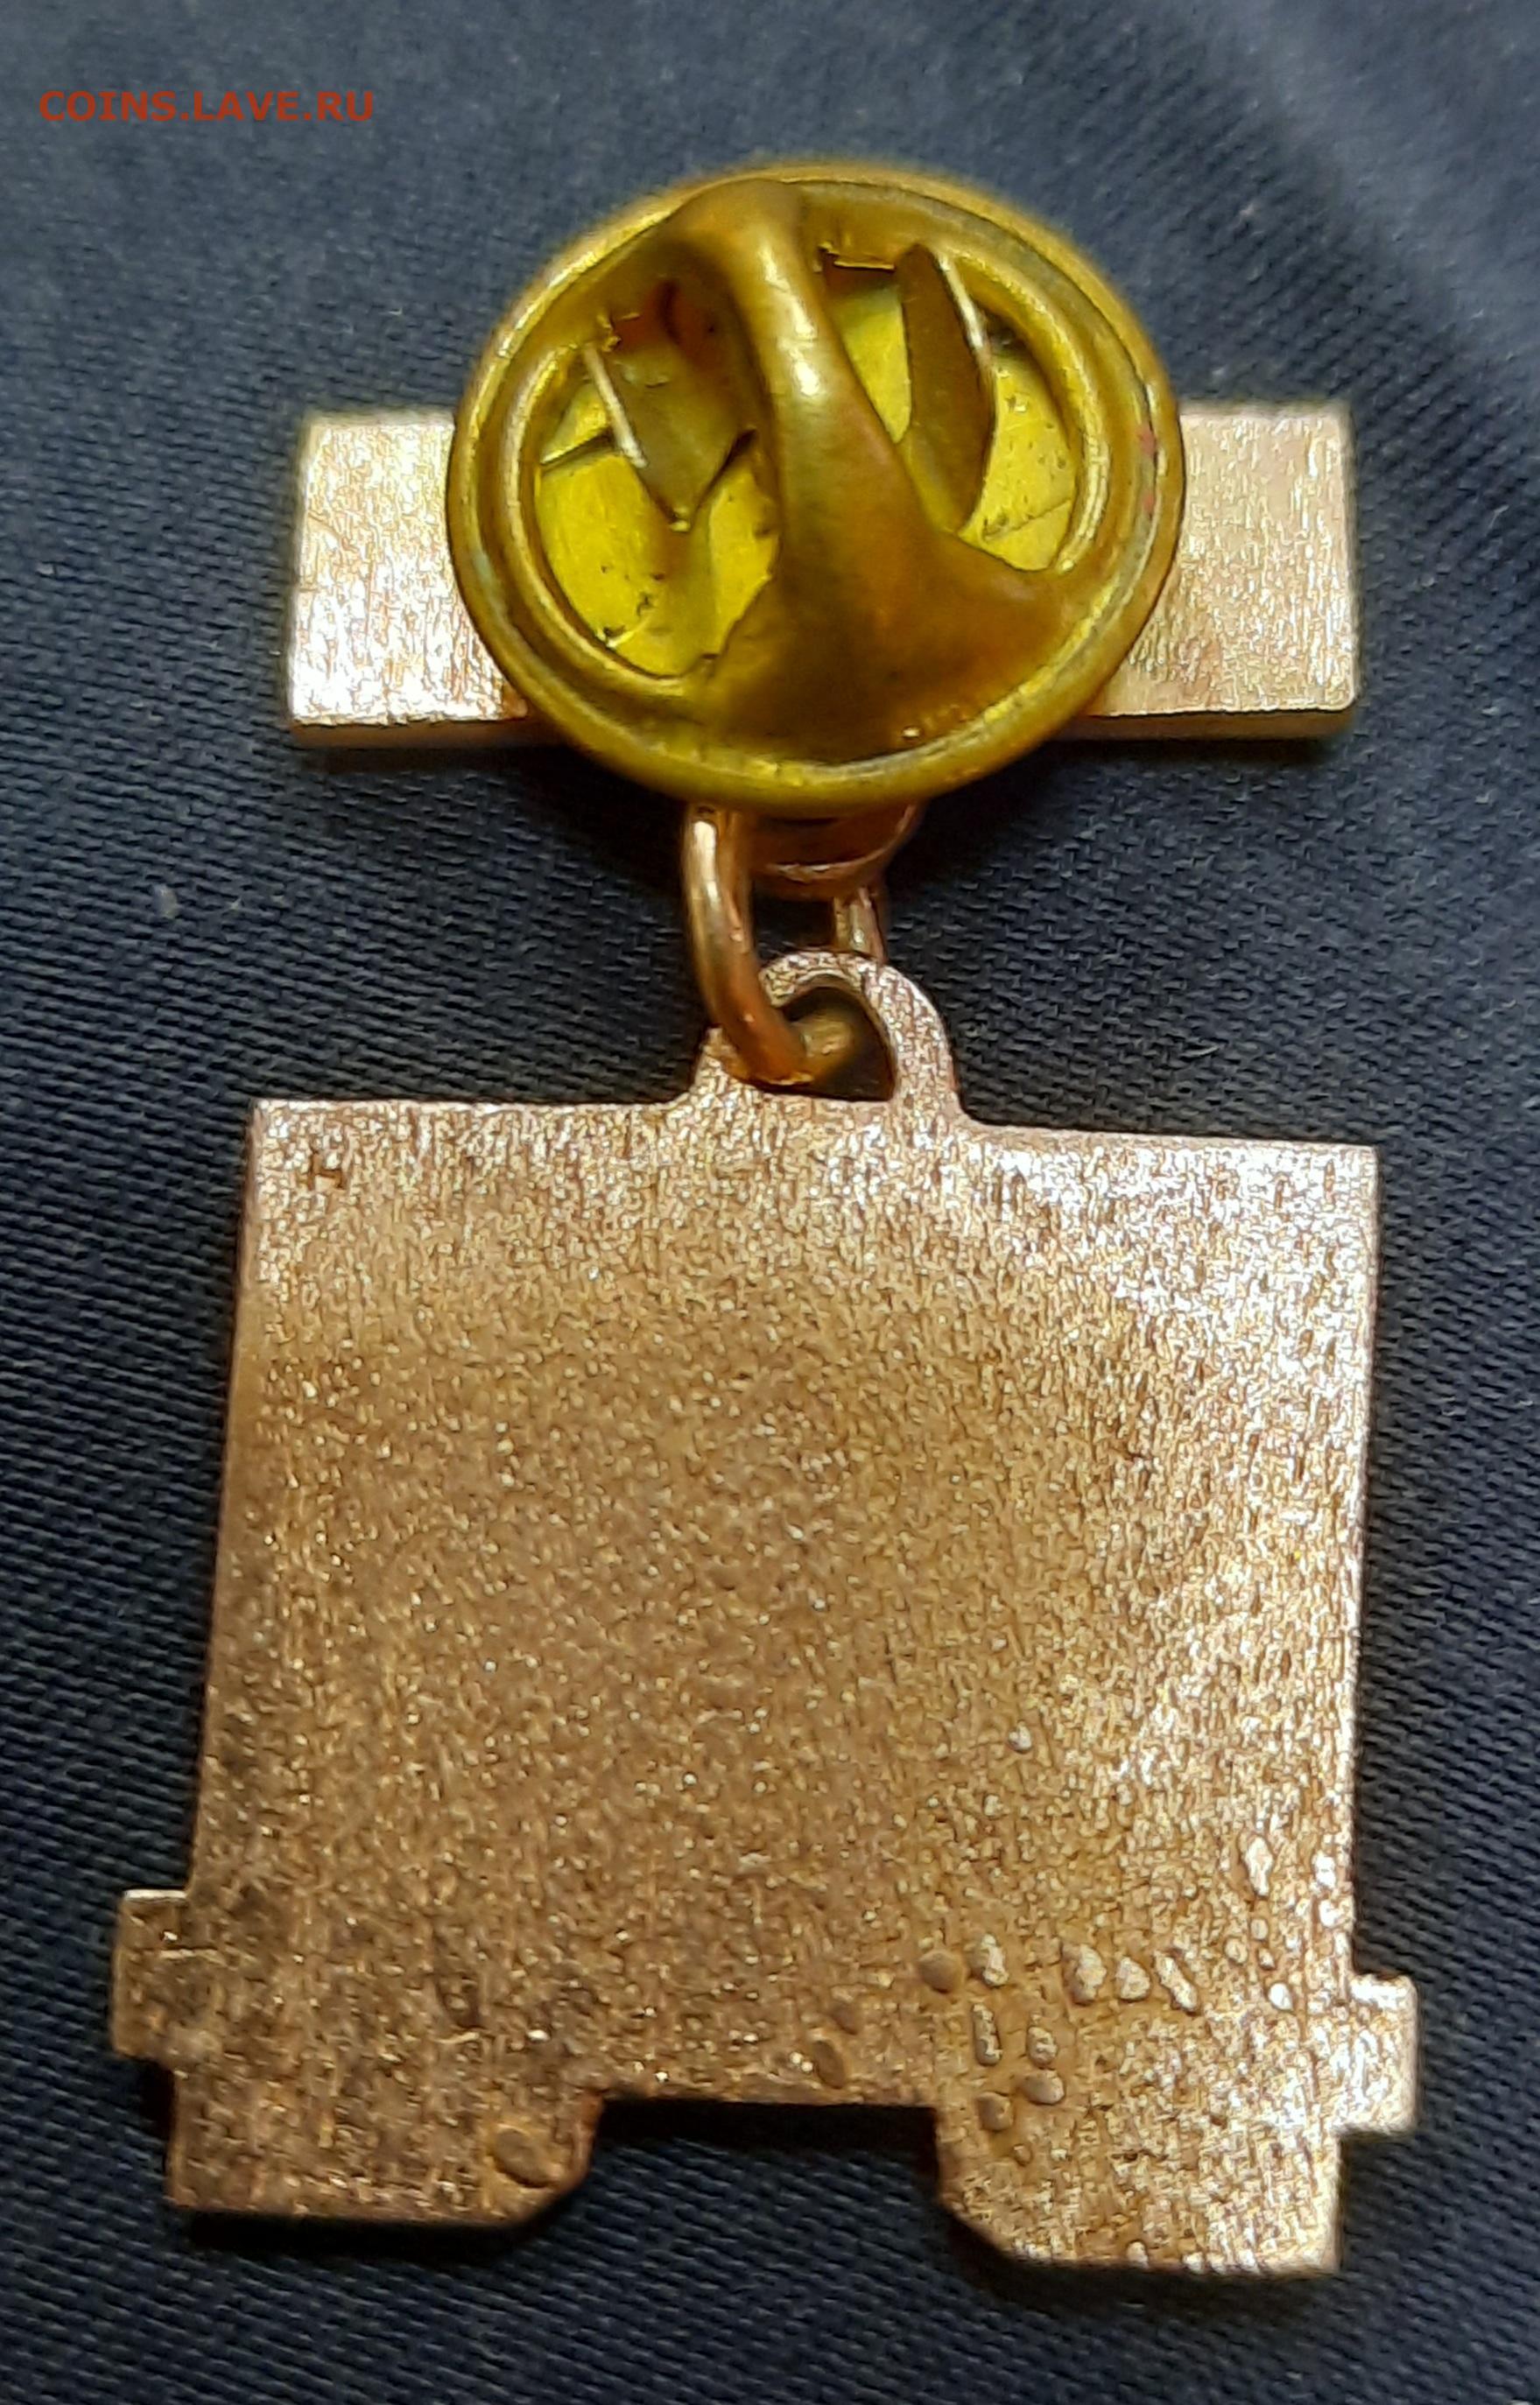 гей форум золото якутии